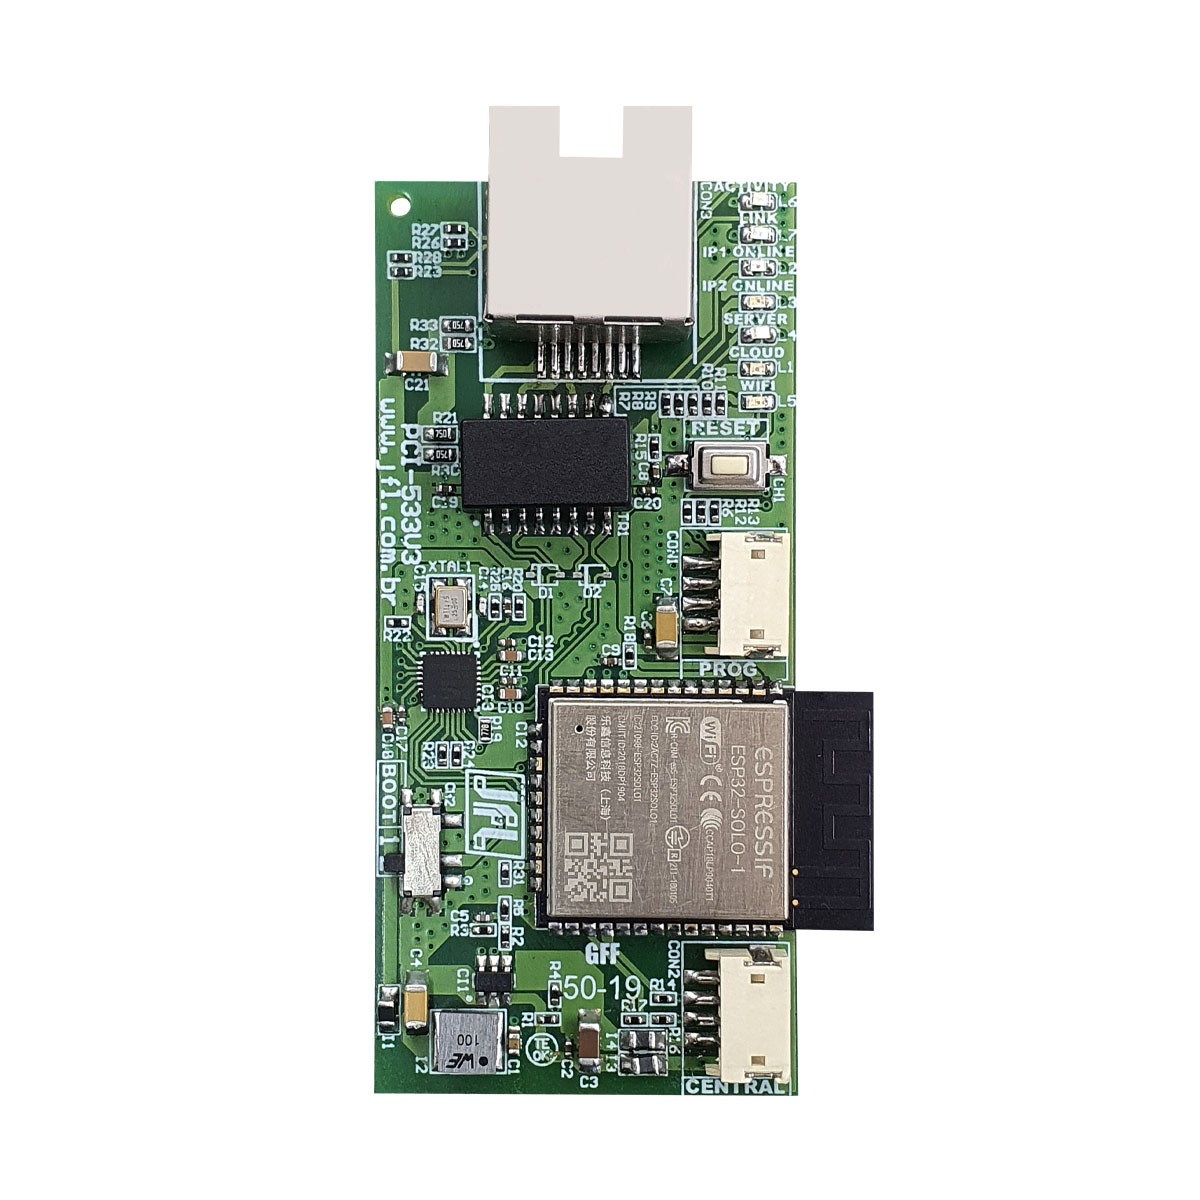 Kit Active 32 Duo Jfl Sem Fio Sensores 520 Duo E Ts 400